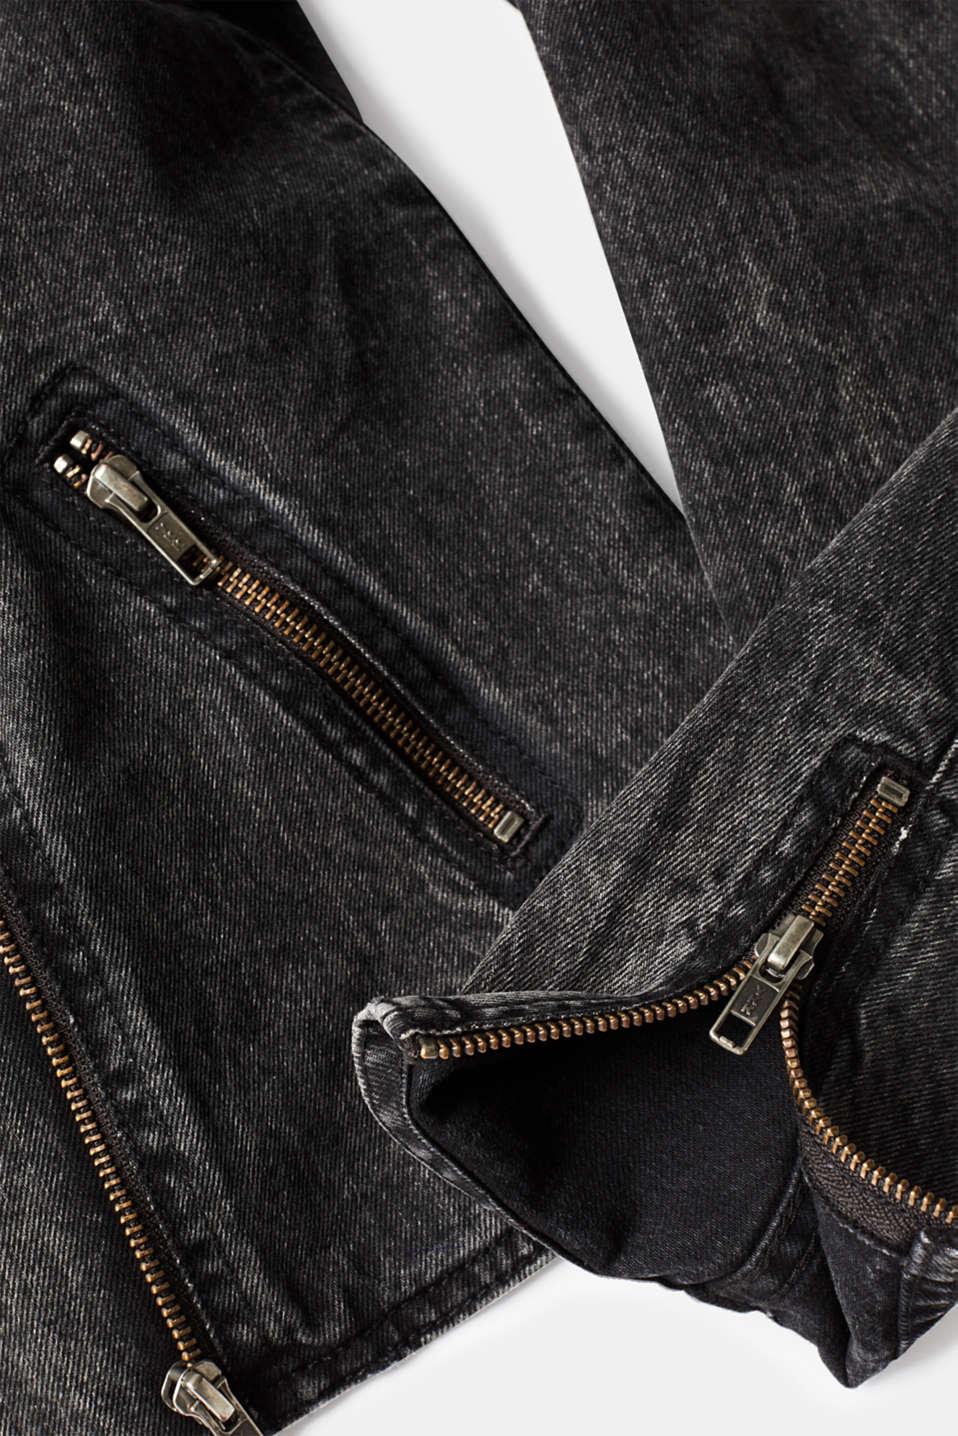 Jackets indoor denim, GREY DARK WASH, detail image number 4